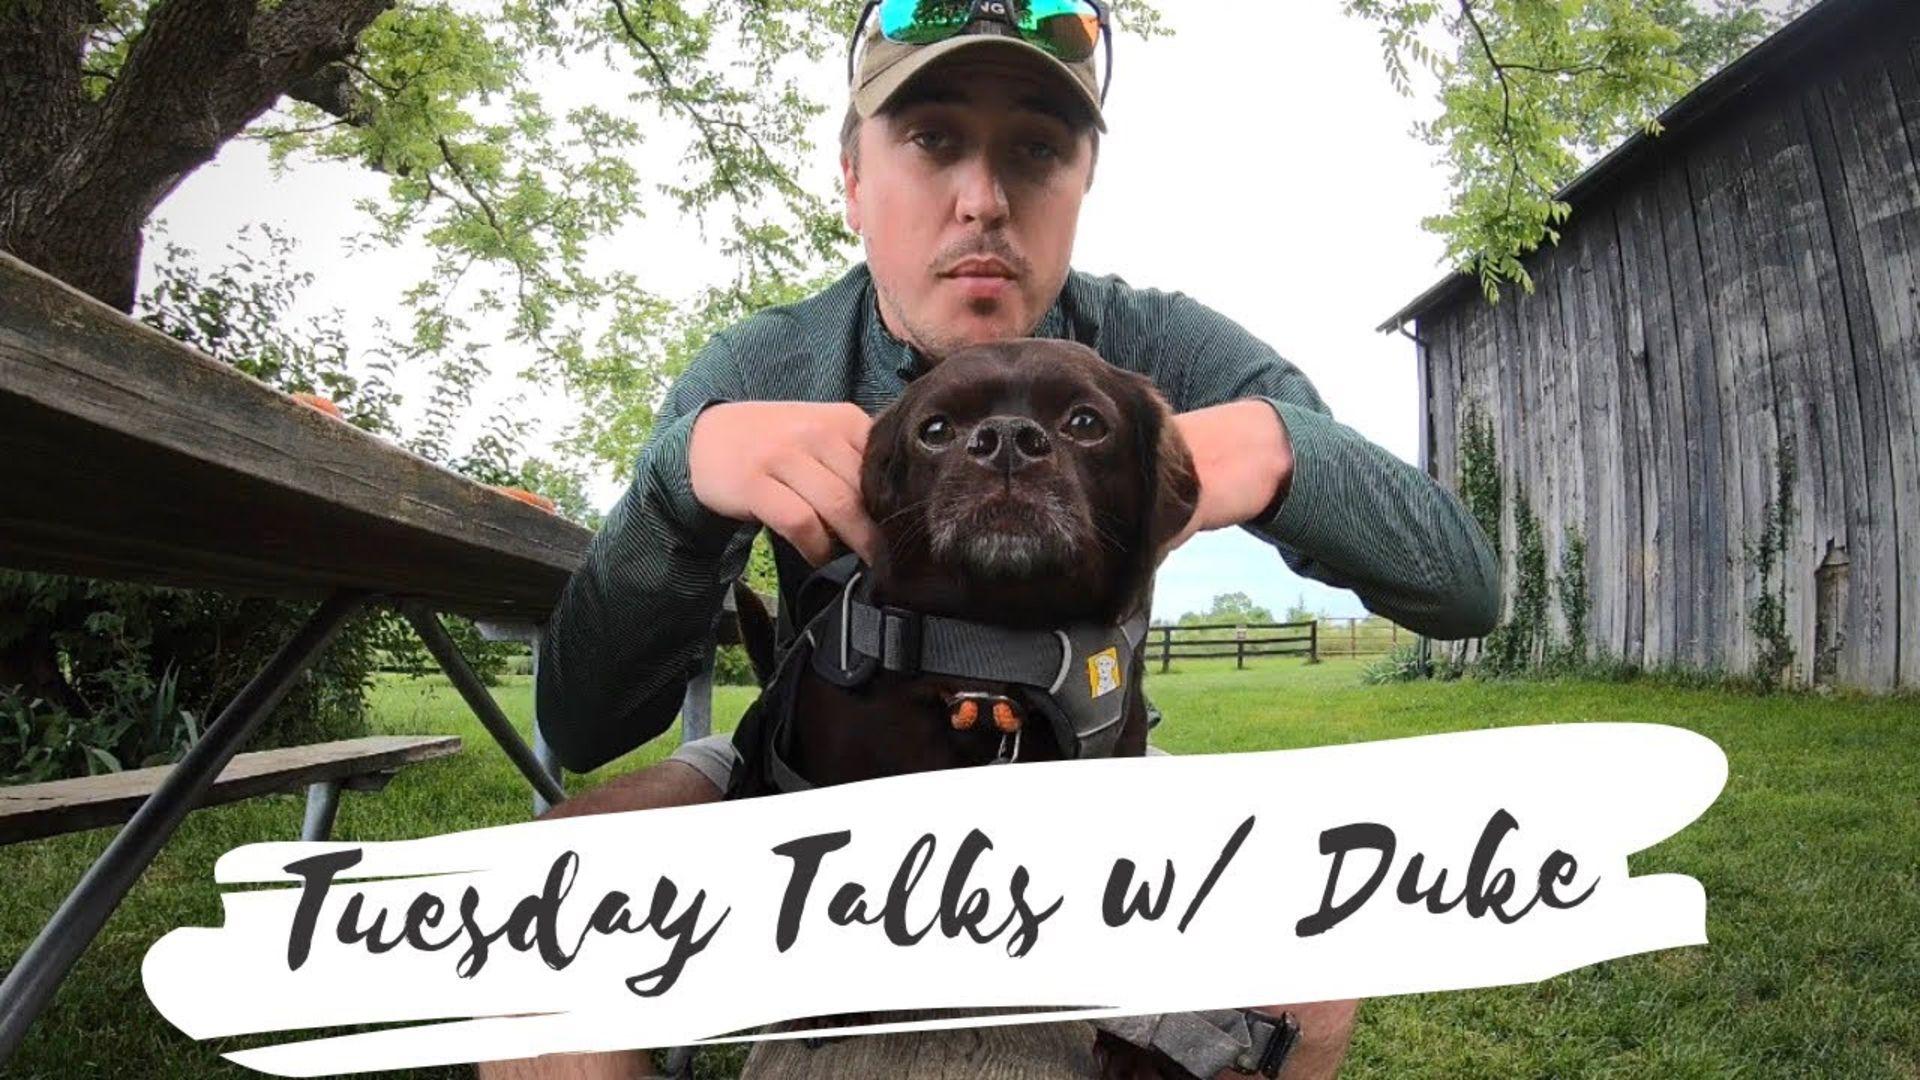 Tuesday Talks with Duke S1:E2 – Duke got stung by a bee